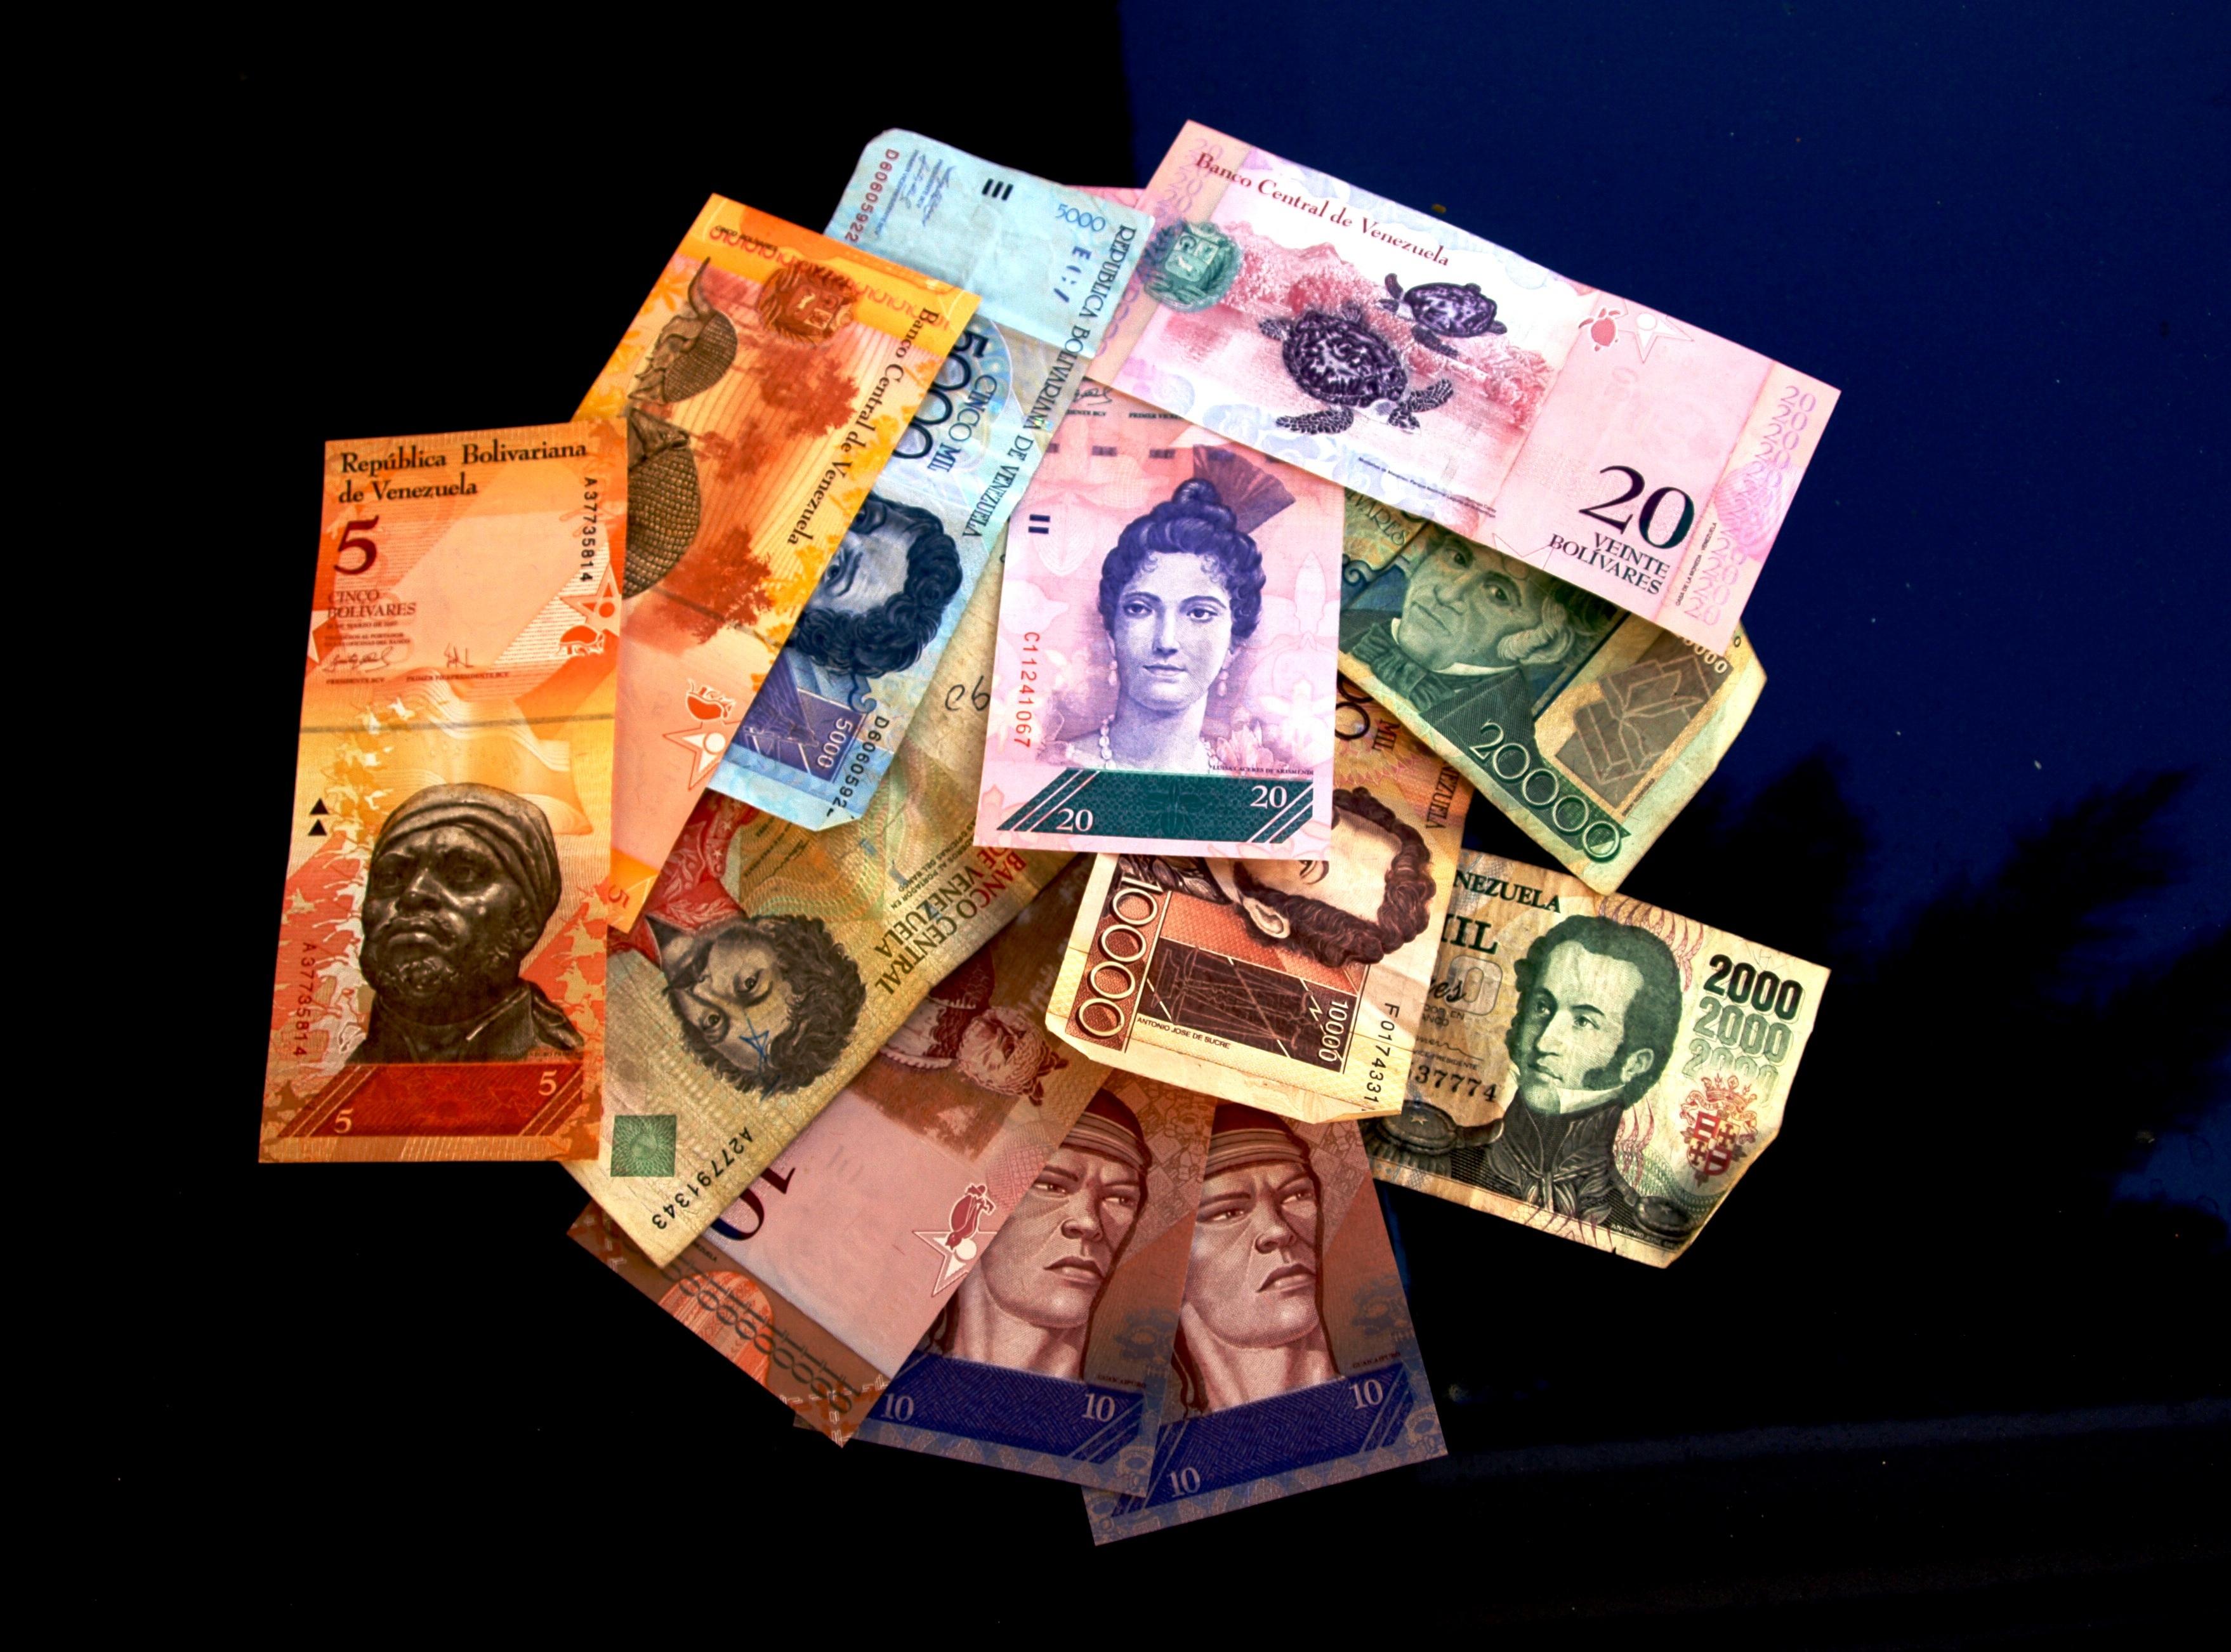 Hundreds of thousands flee Venezuela during hyperinflation crisis